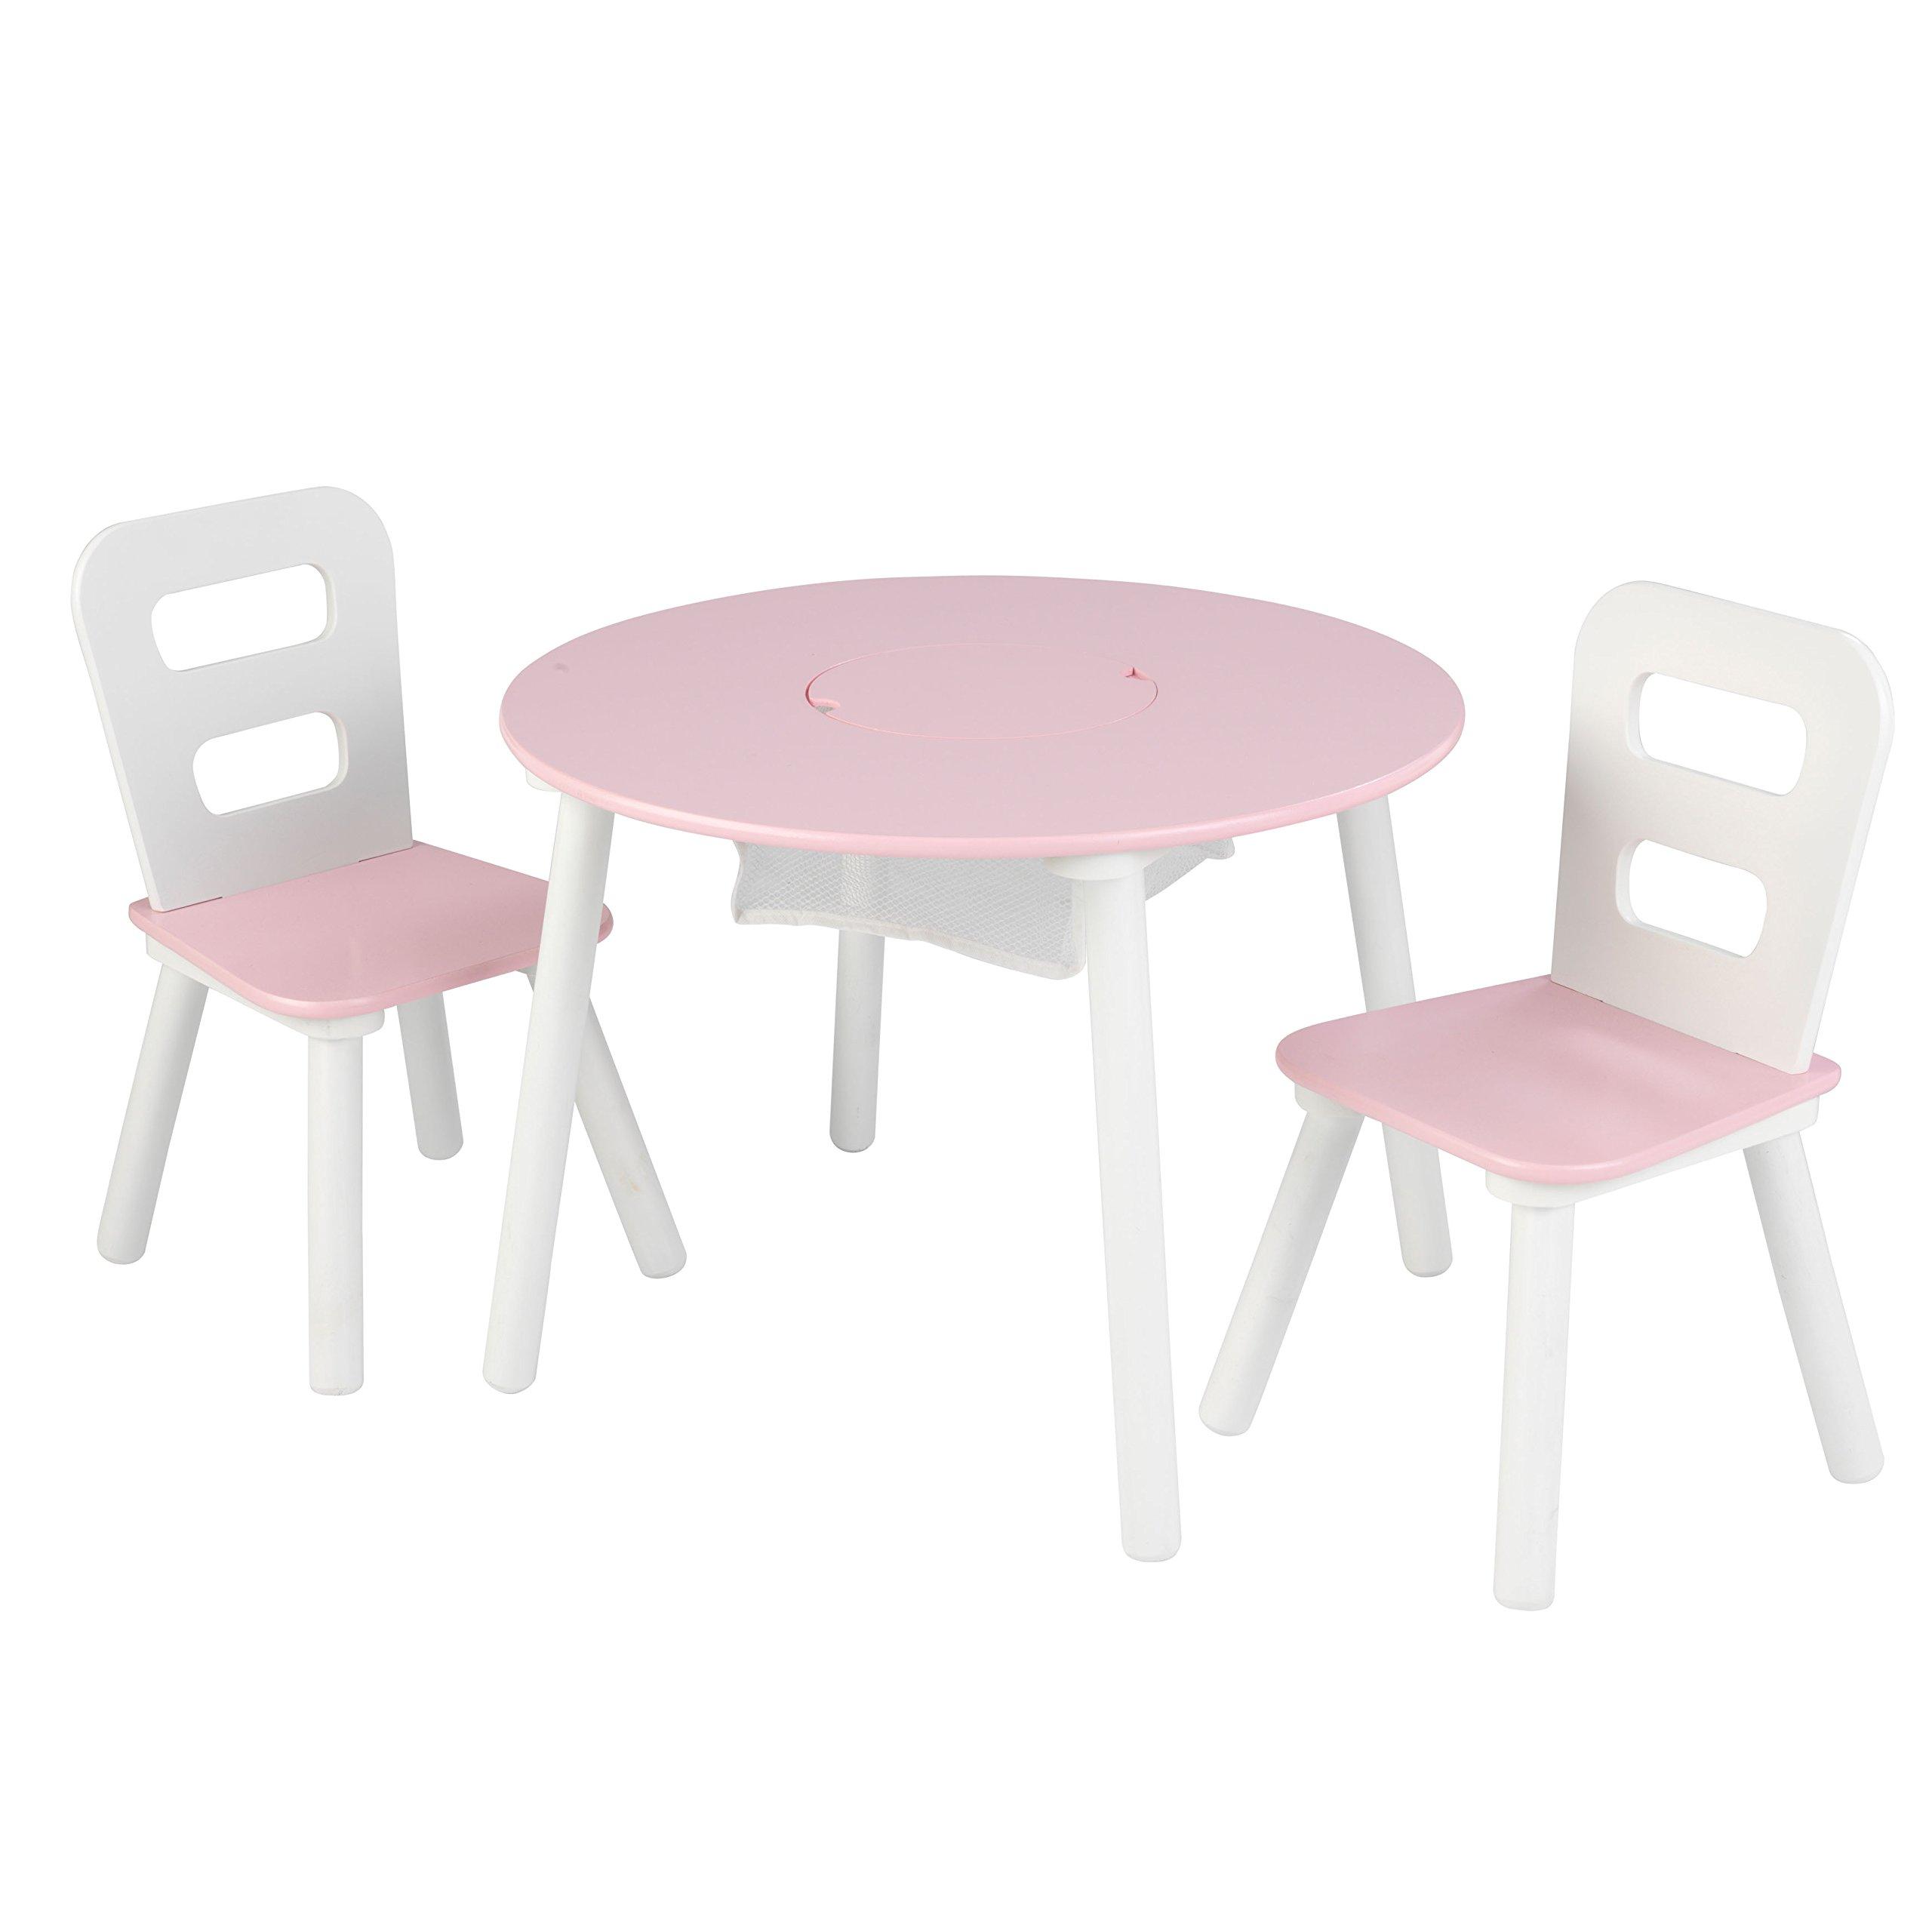 KidKraft Wooden Round Table & 2 Chair Set with Center Mesh Storage - Pink & White by KidKraft